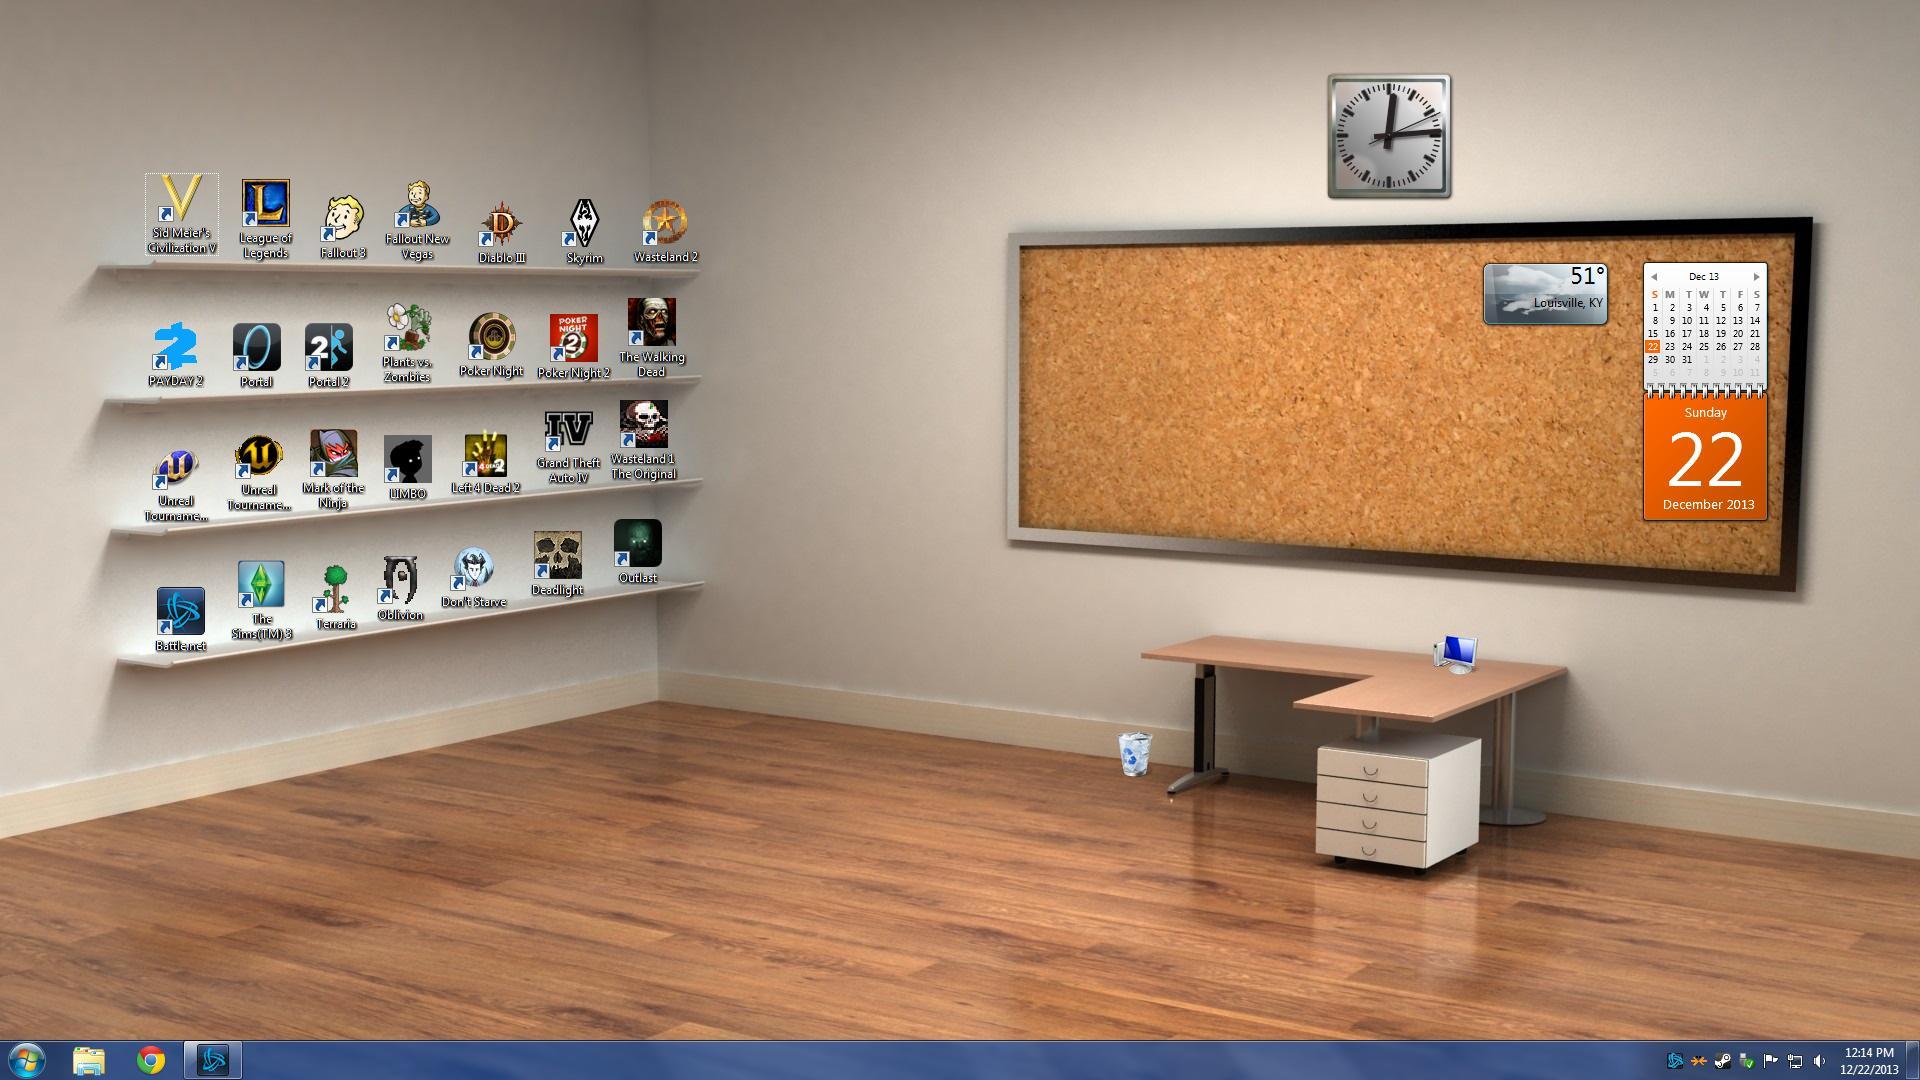 desktop | bookshelf desktop wallpaper | know your meme